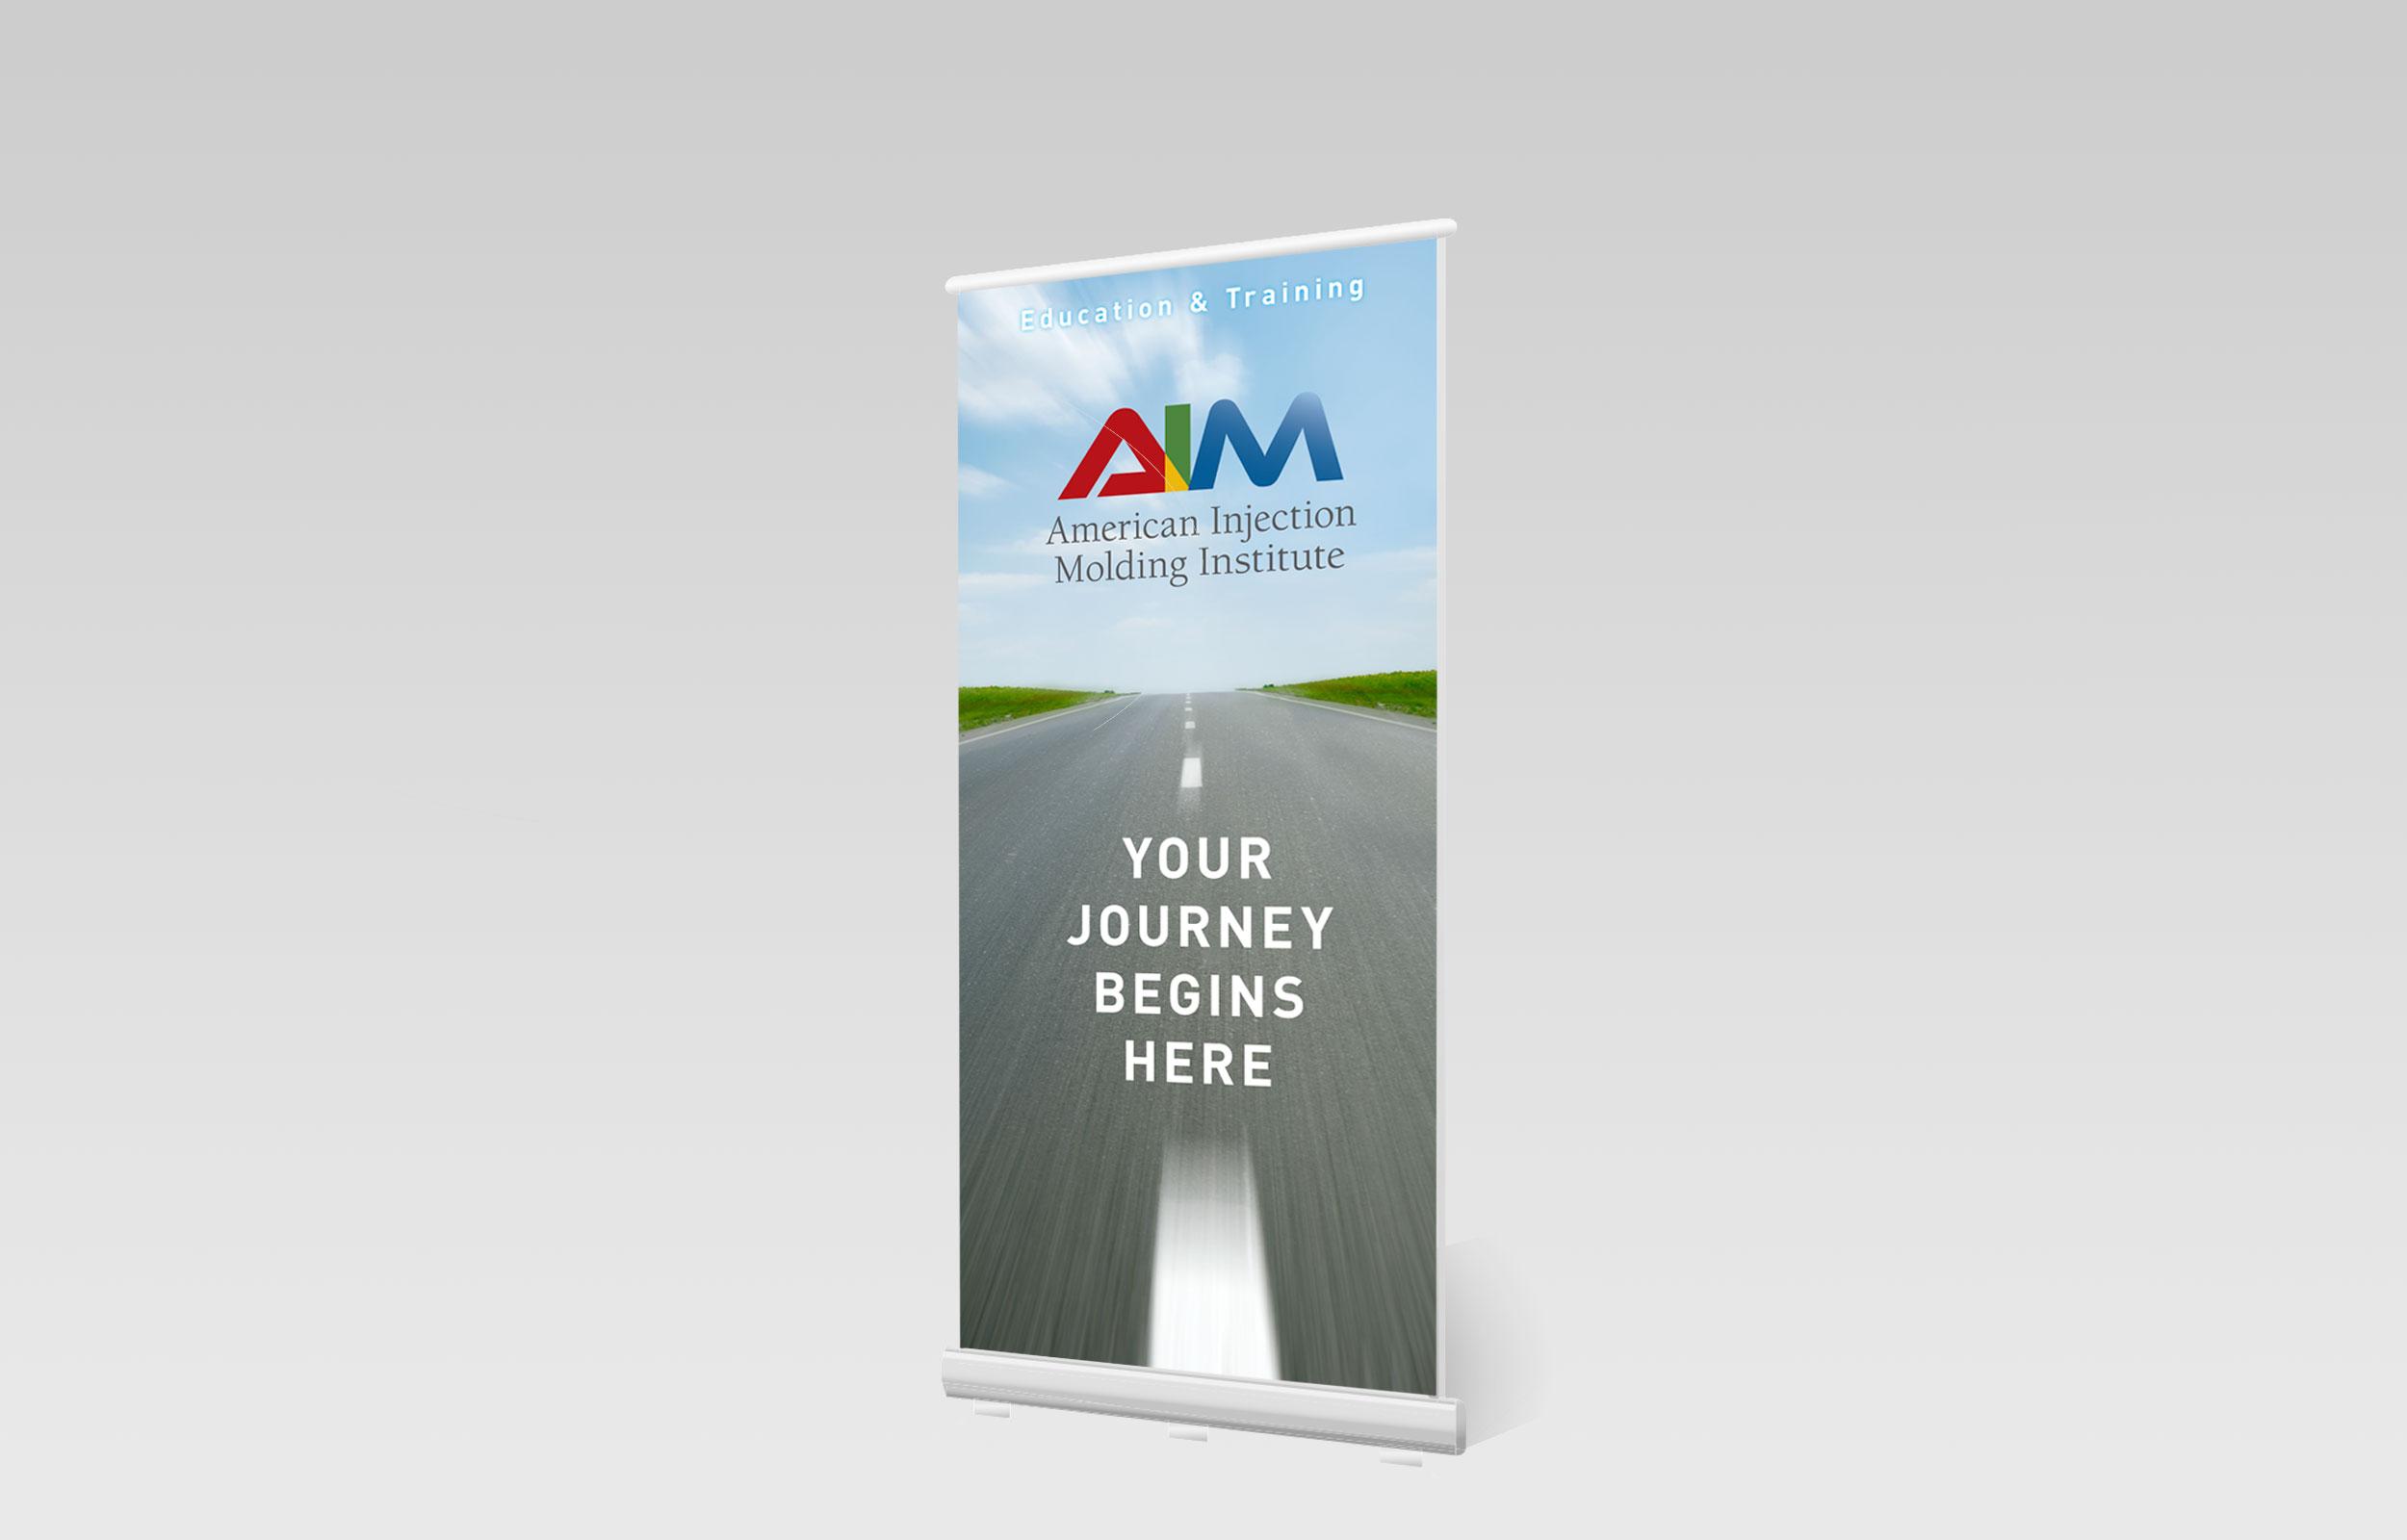 http://i0.wp.com/papaadvertising.com/wp-content/uploads/2015/04/AIM-journey1.jpg?fit=2500%2C1600